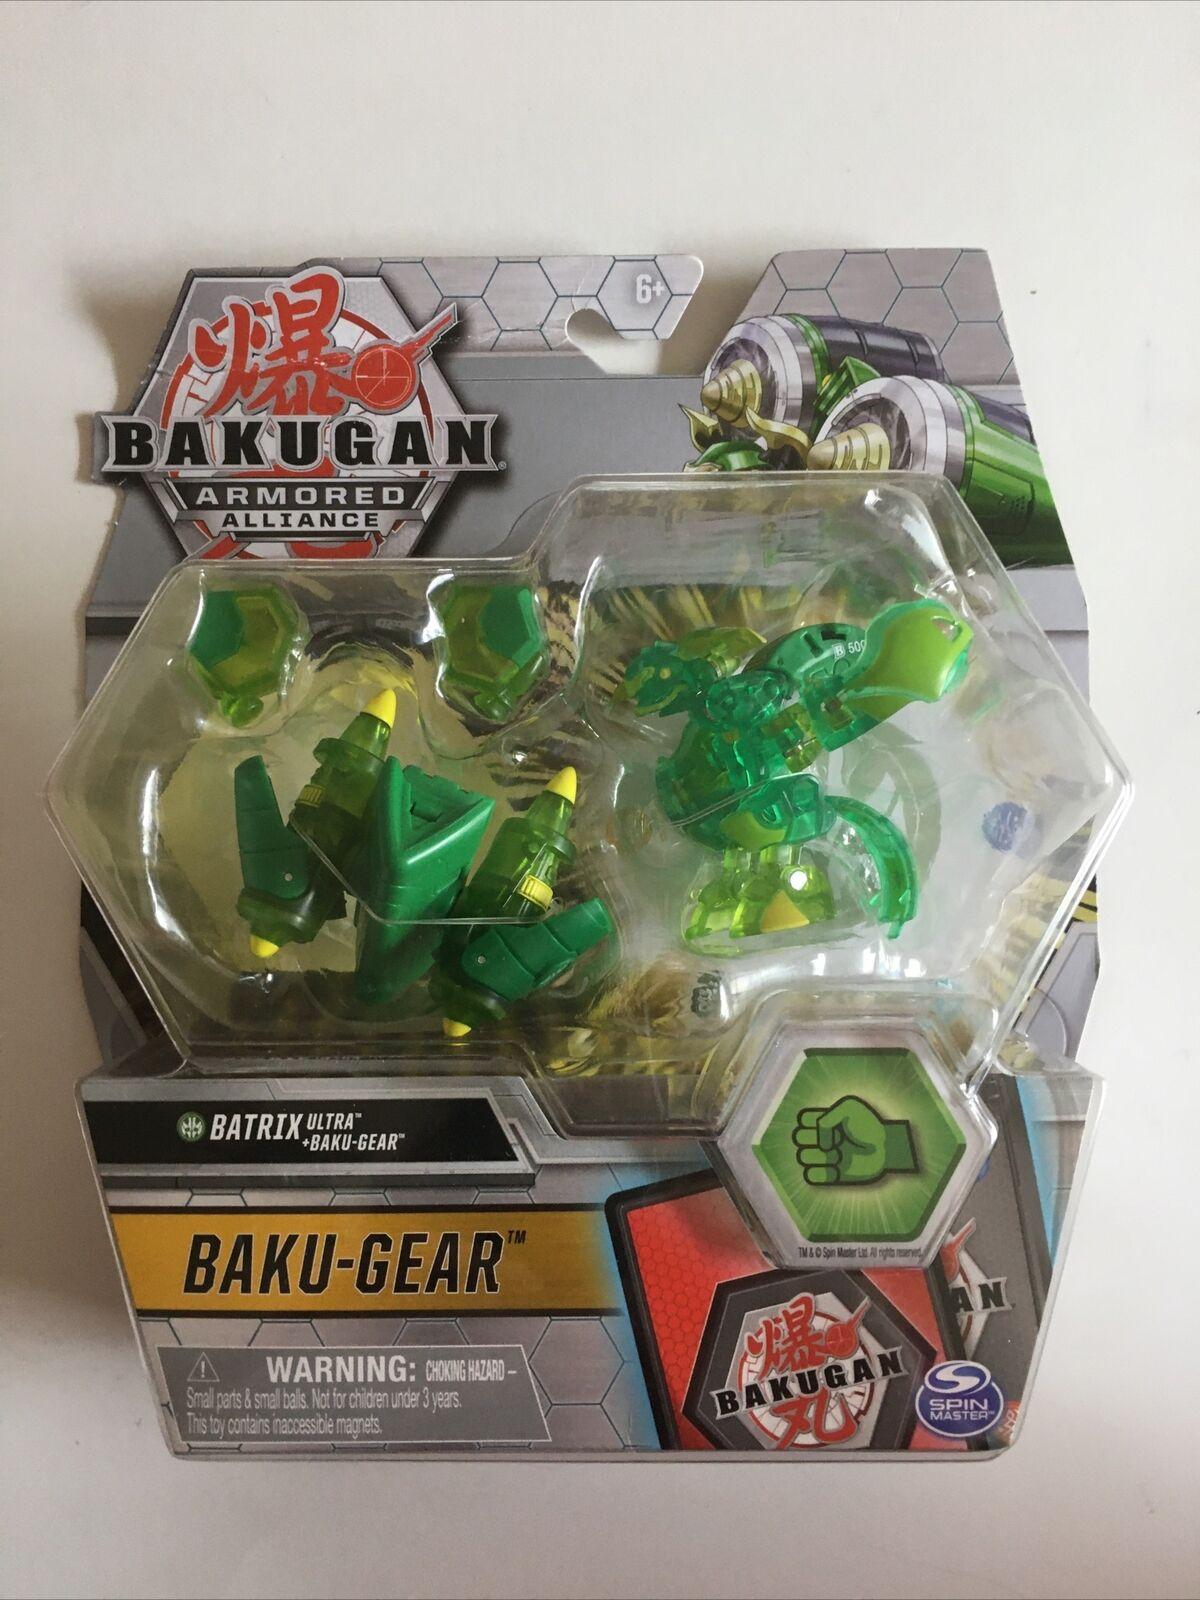 Ventus Batrix with Transforming Baku-Gear Bakugan Ultra Armored Alliance